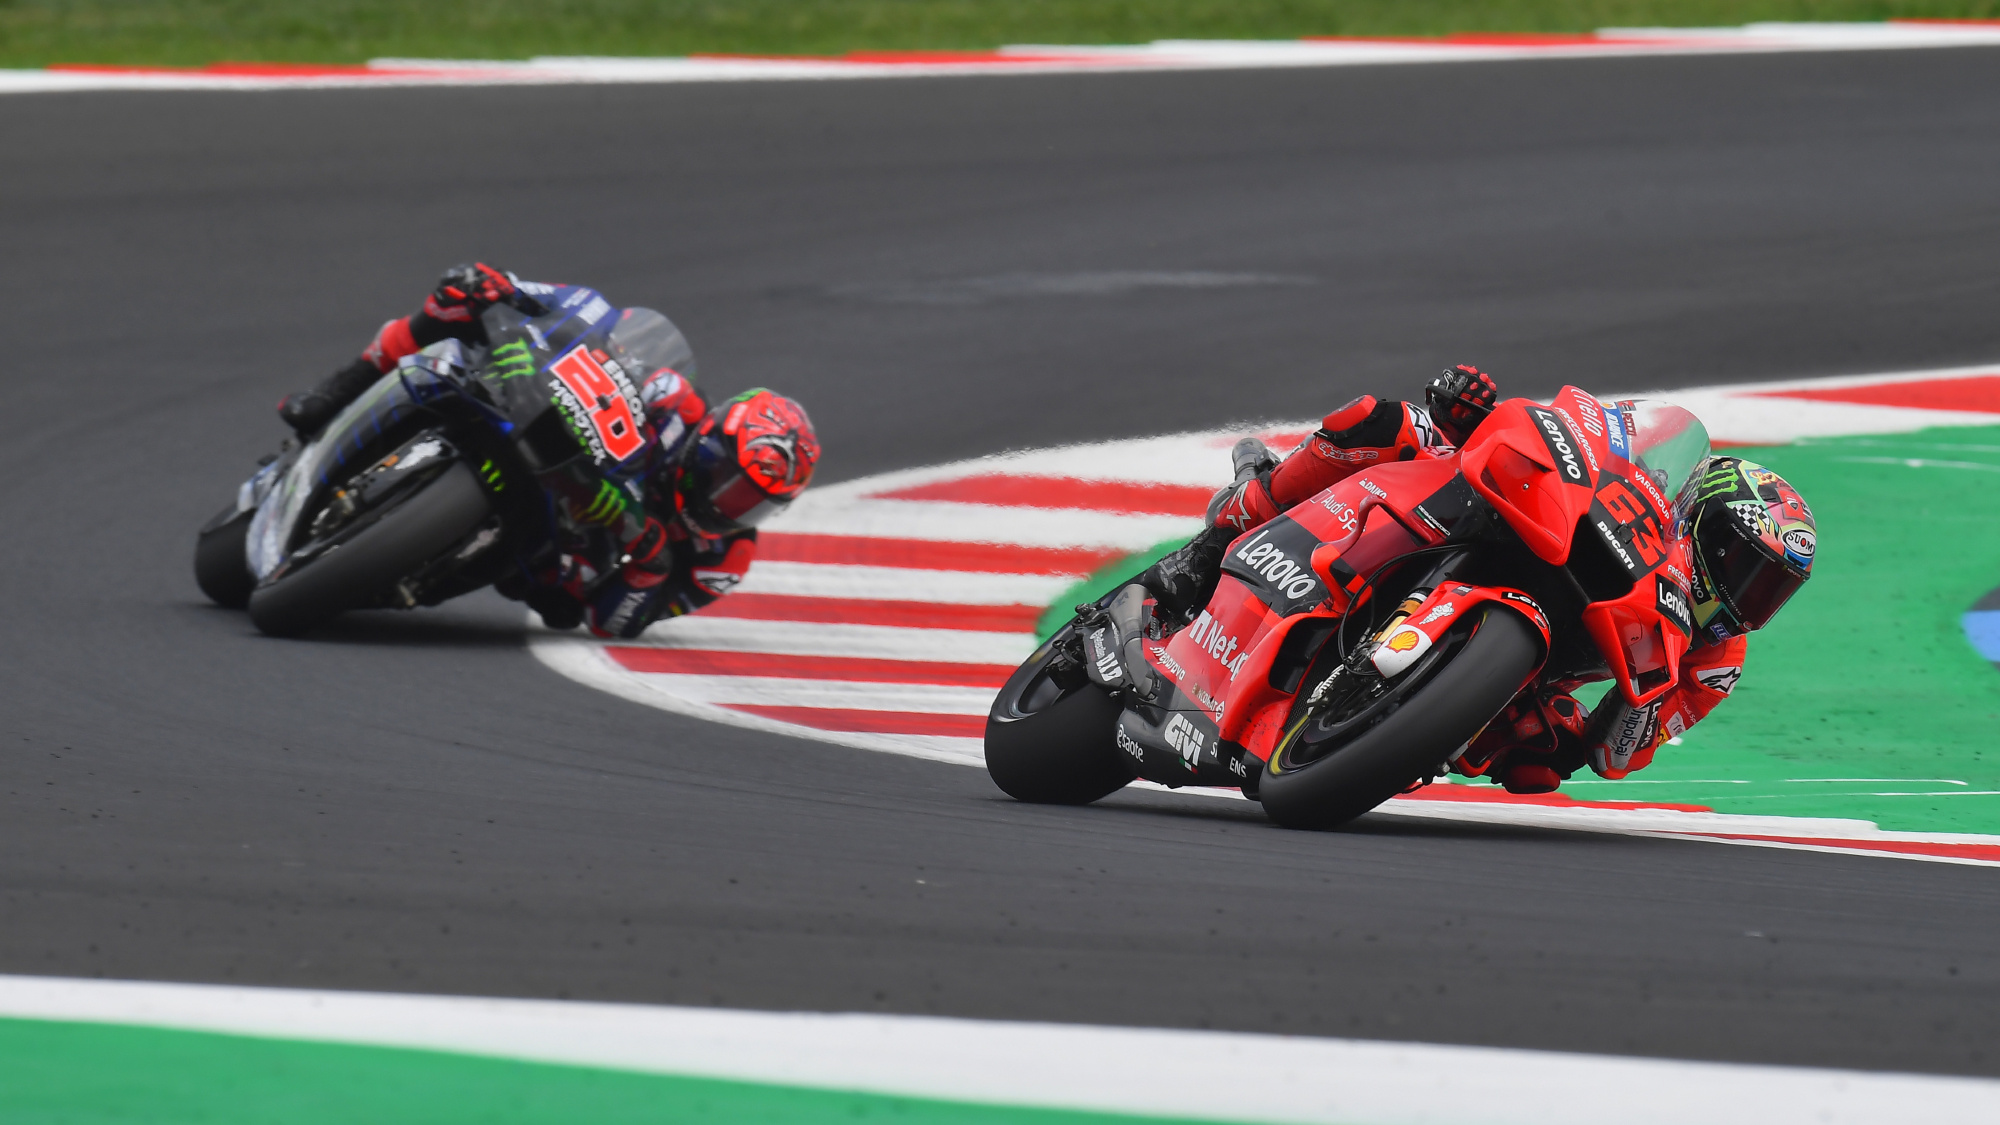 Pecco Bagnaia, 2021 Misano MotoGP